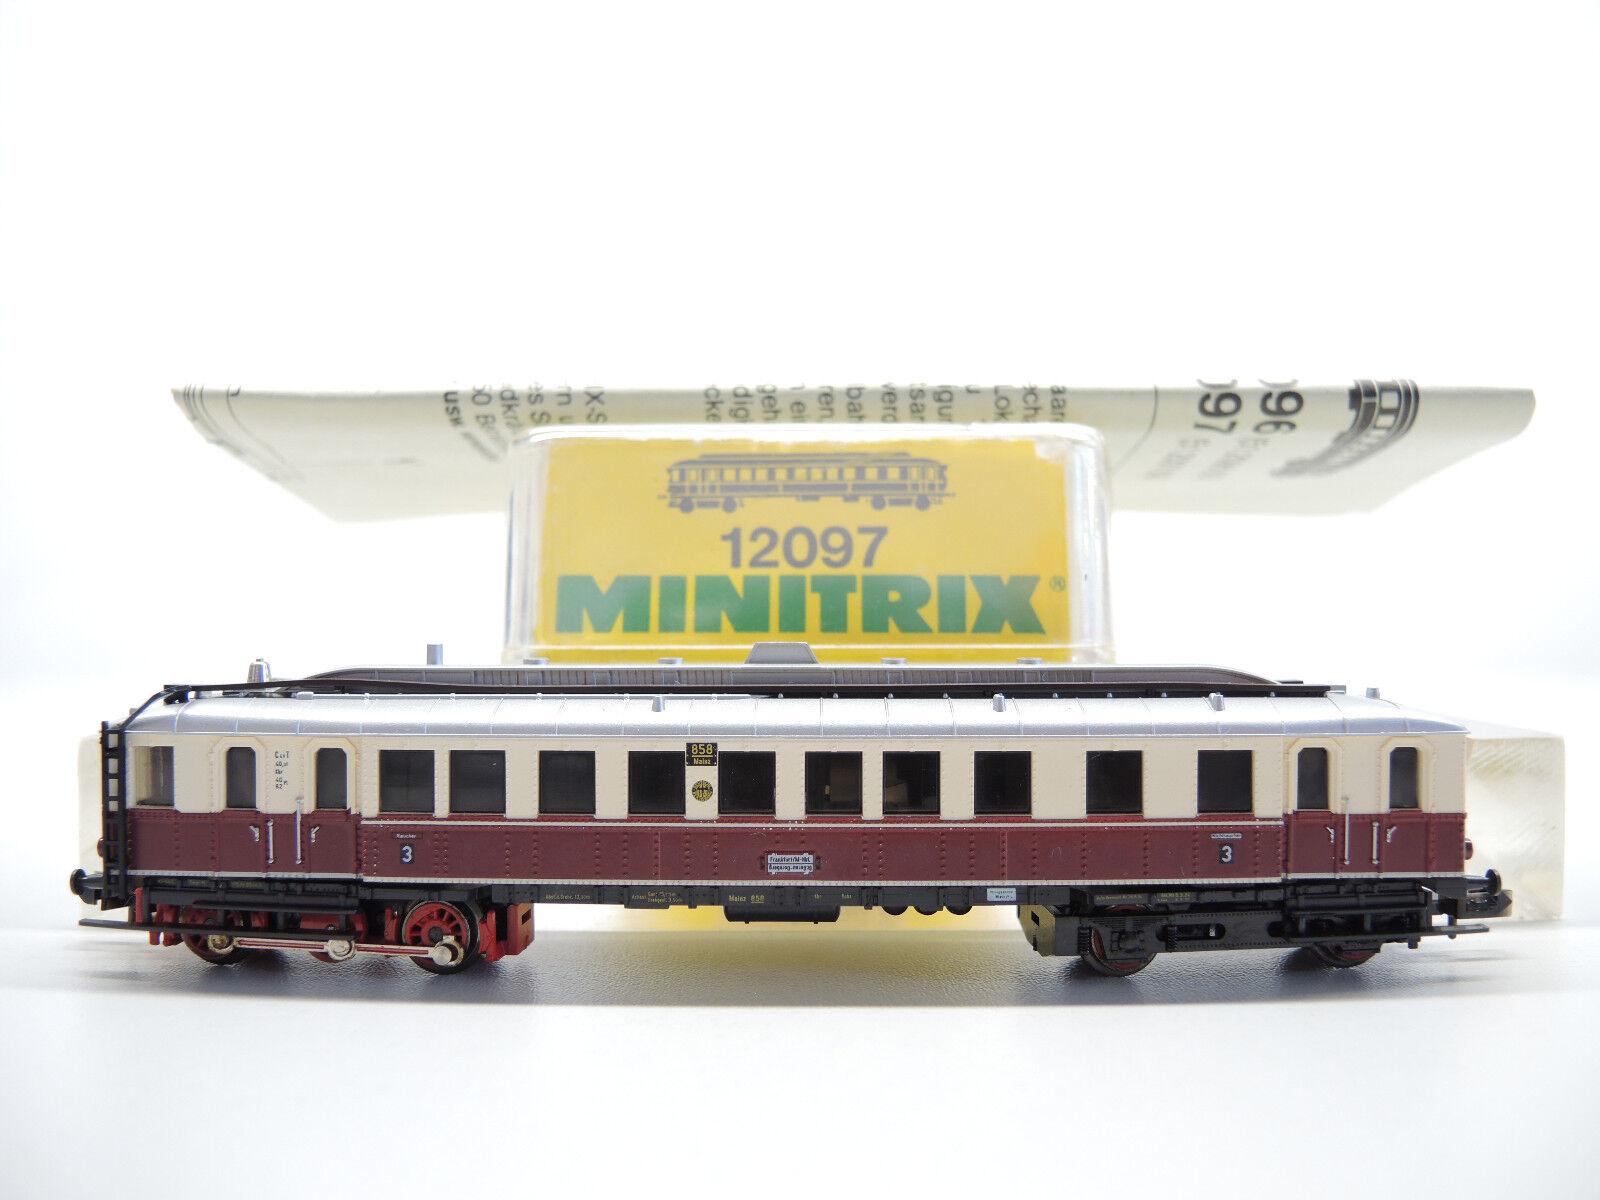 Minitrix Minitrix Minitrix 12097 Motore Diesel auto VT 858 Magonza della DRG molto bene OVP 7e7b12